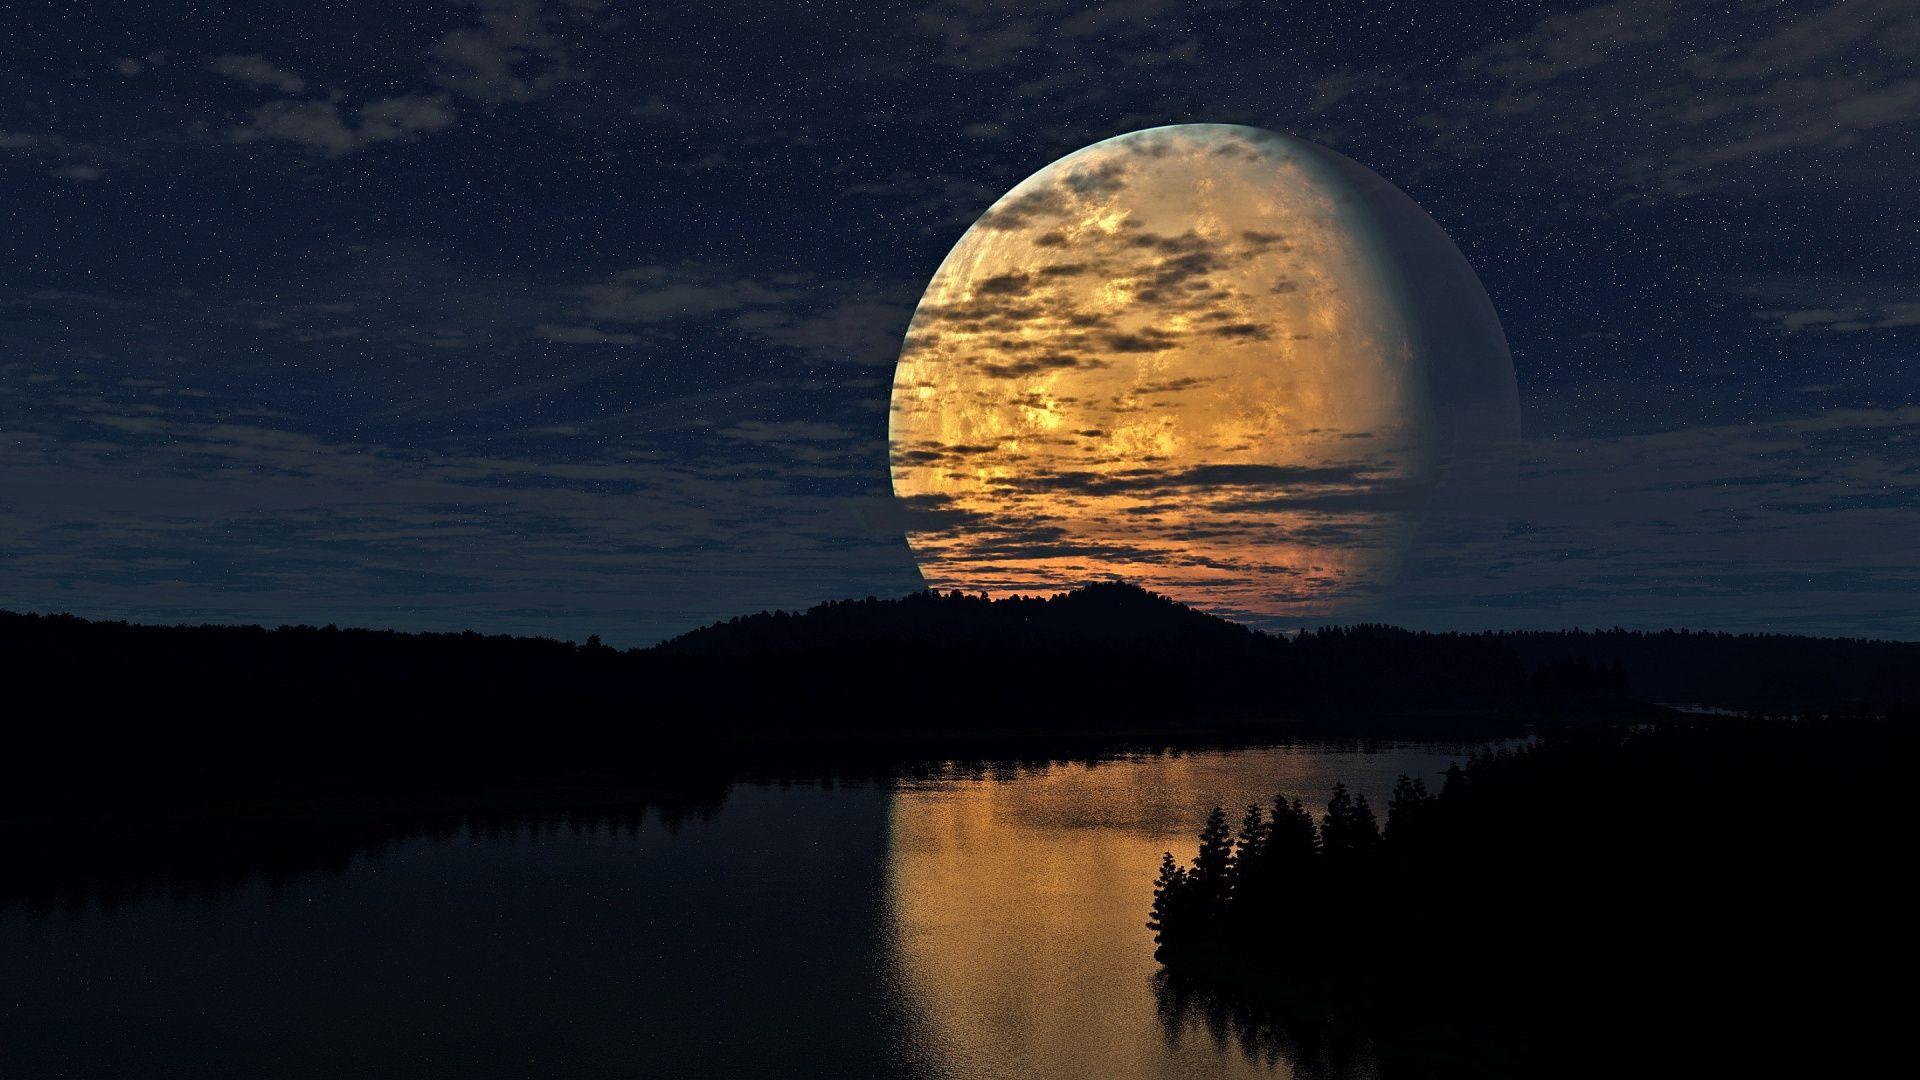 Night Moon River Scenery Wallpaper In 1920x1080 Night Sky Moon Sky Moon Beautiful Moon